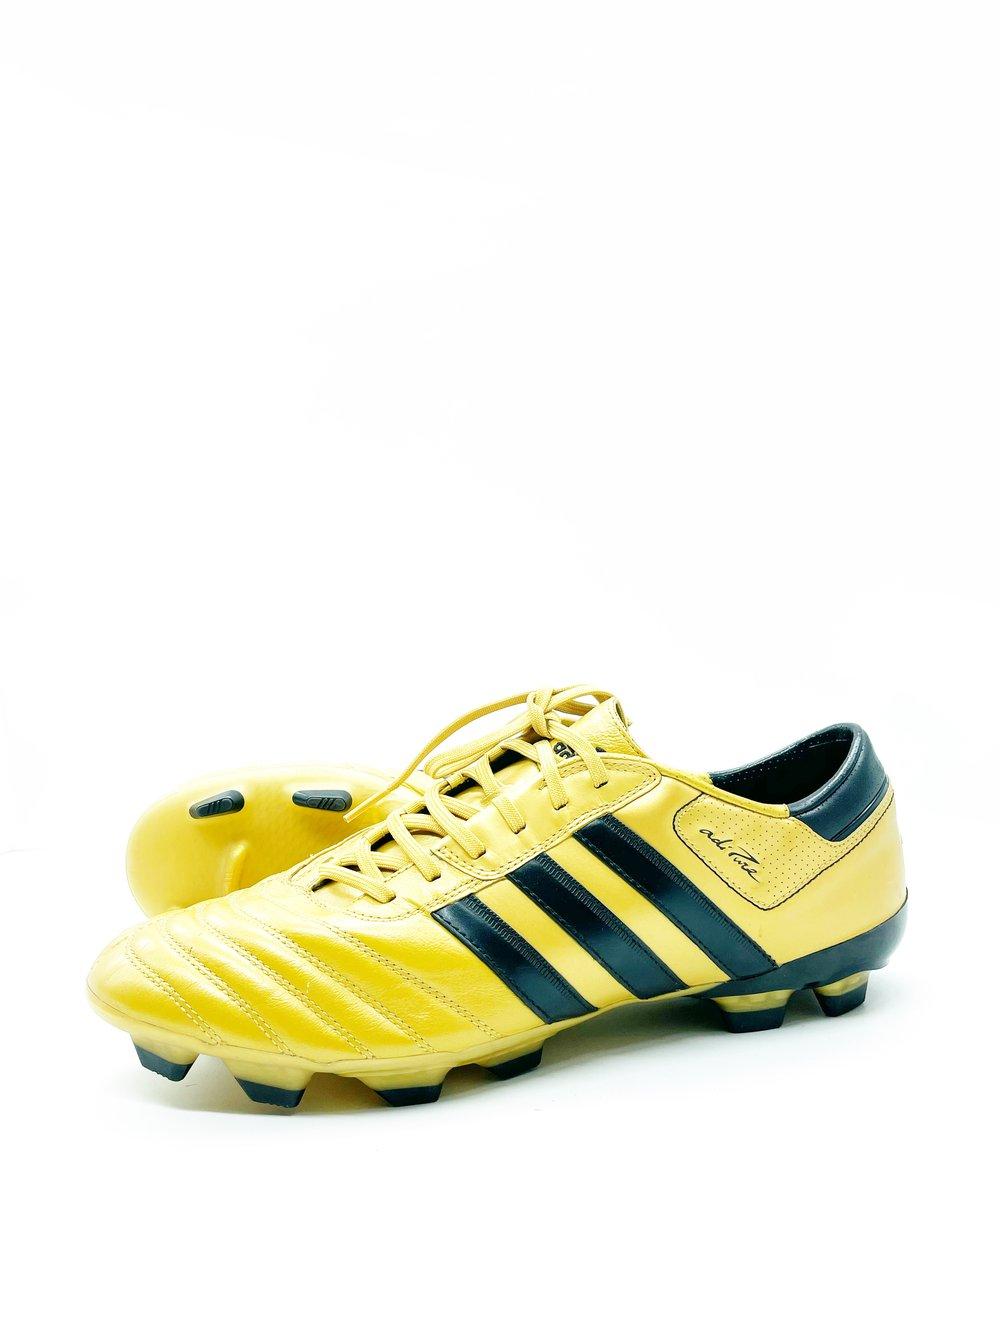 Image of Adidas adipure III FG gold